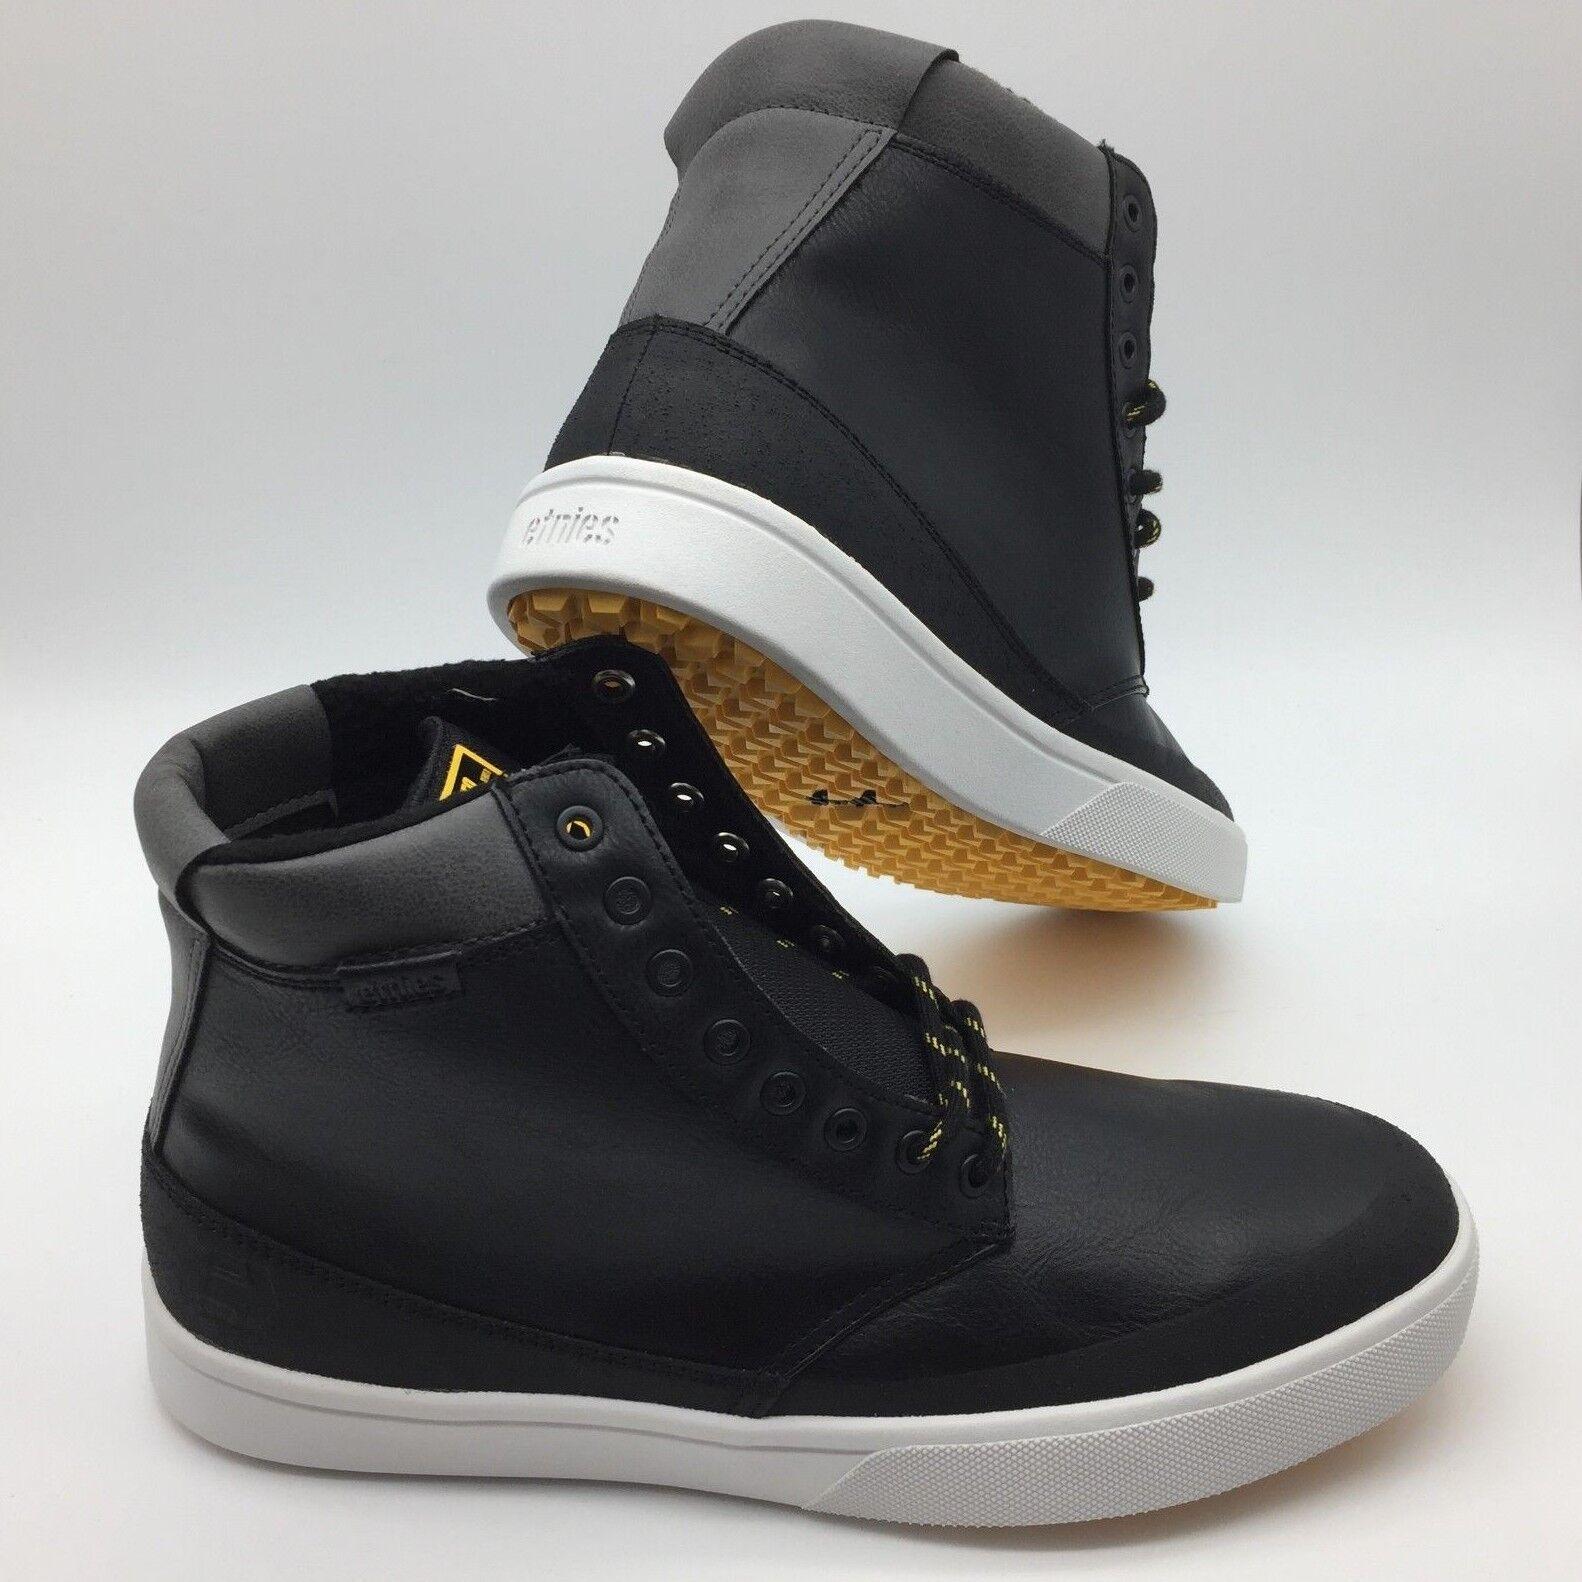 Etnies Herren Schuhe Jameson Htw Schwarz Grau Gelb